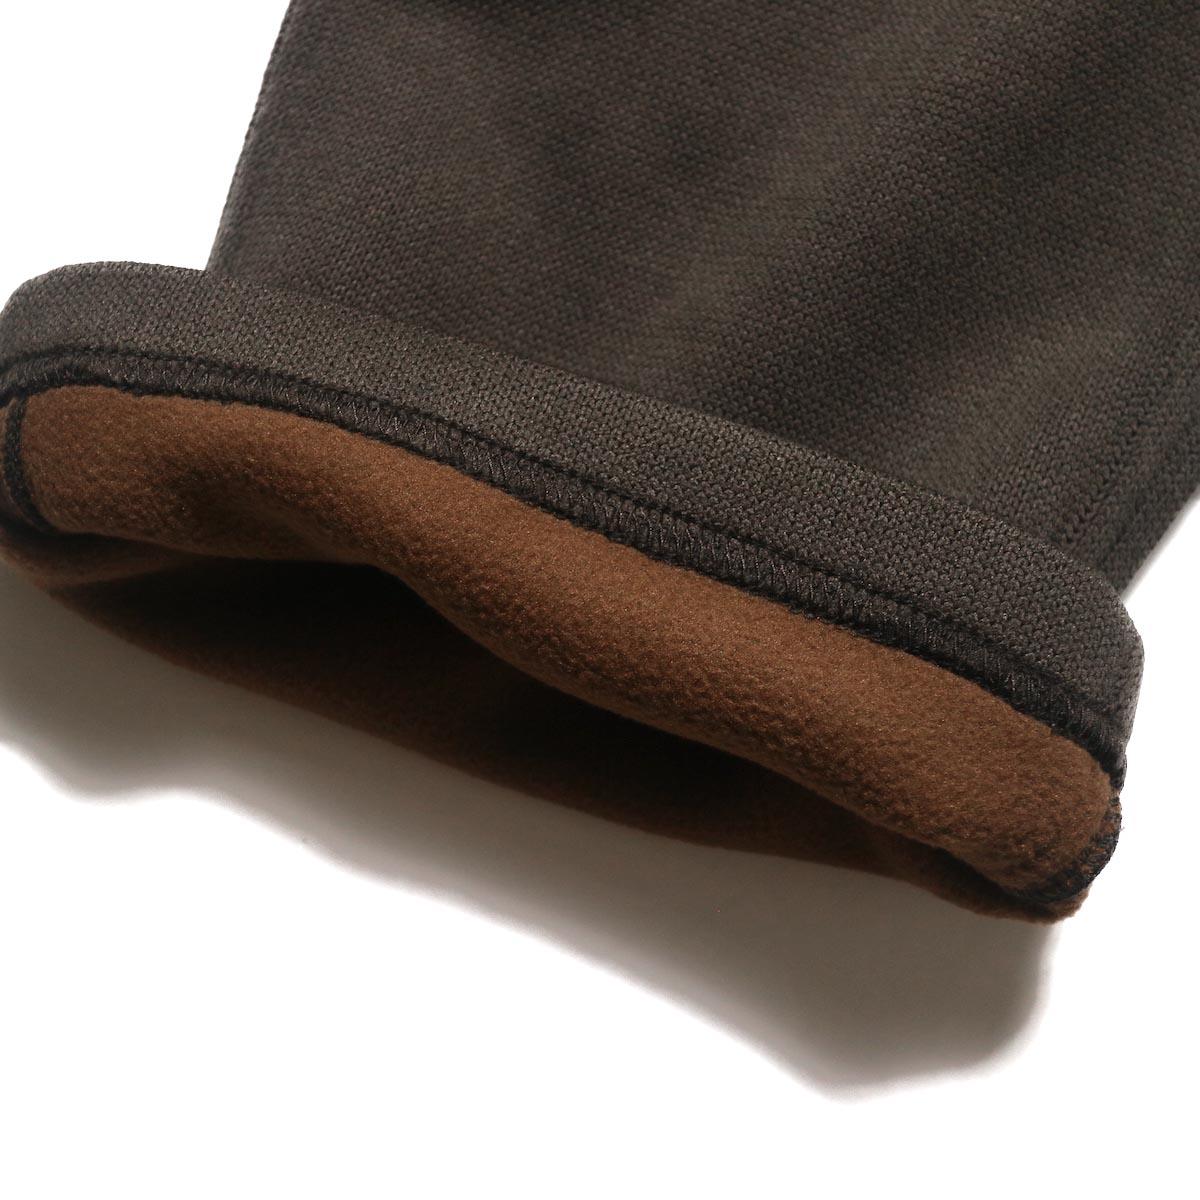 GRAMICCI / BONDING KNIT FLEECE NN-PANTS JUST CUT (Dark Brown)フリース素材